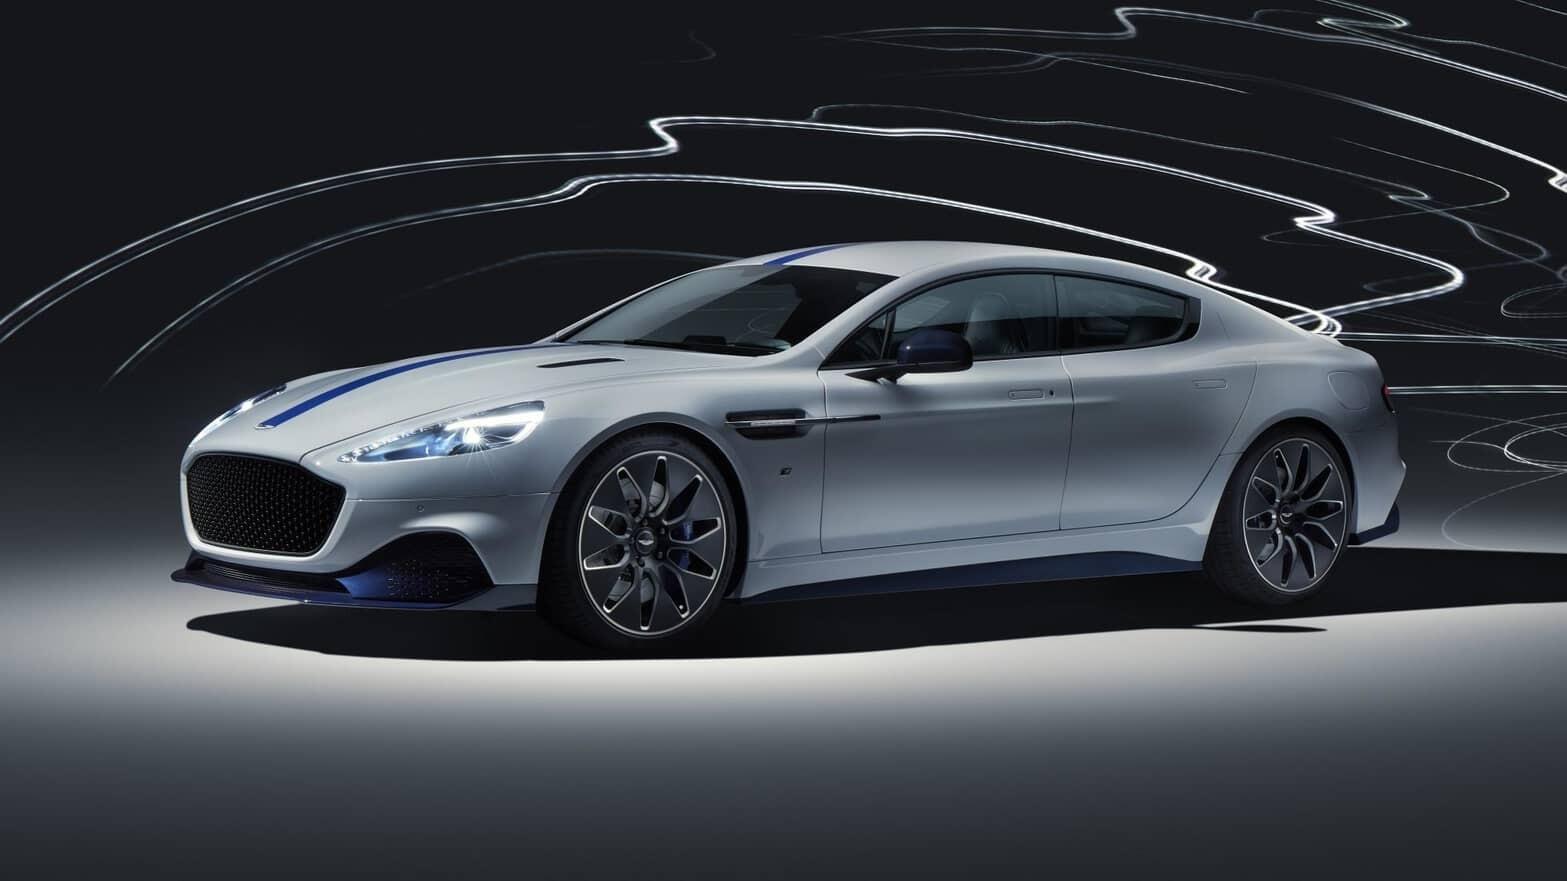 The Aston Martin Rapide E Is A 600bhp All Electric Supercar